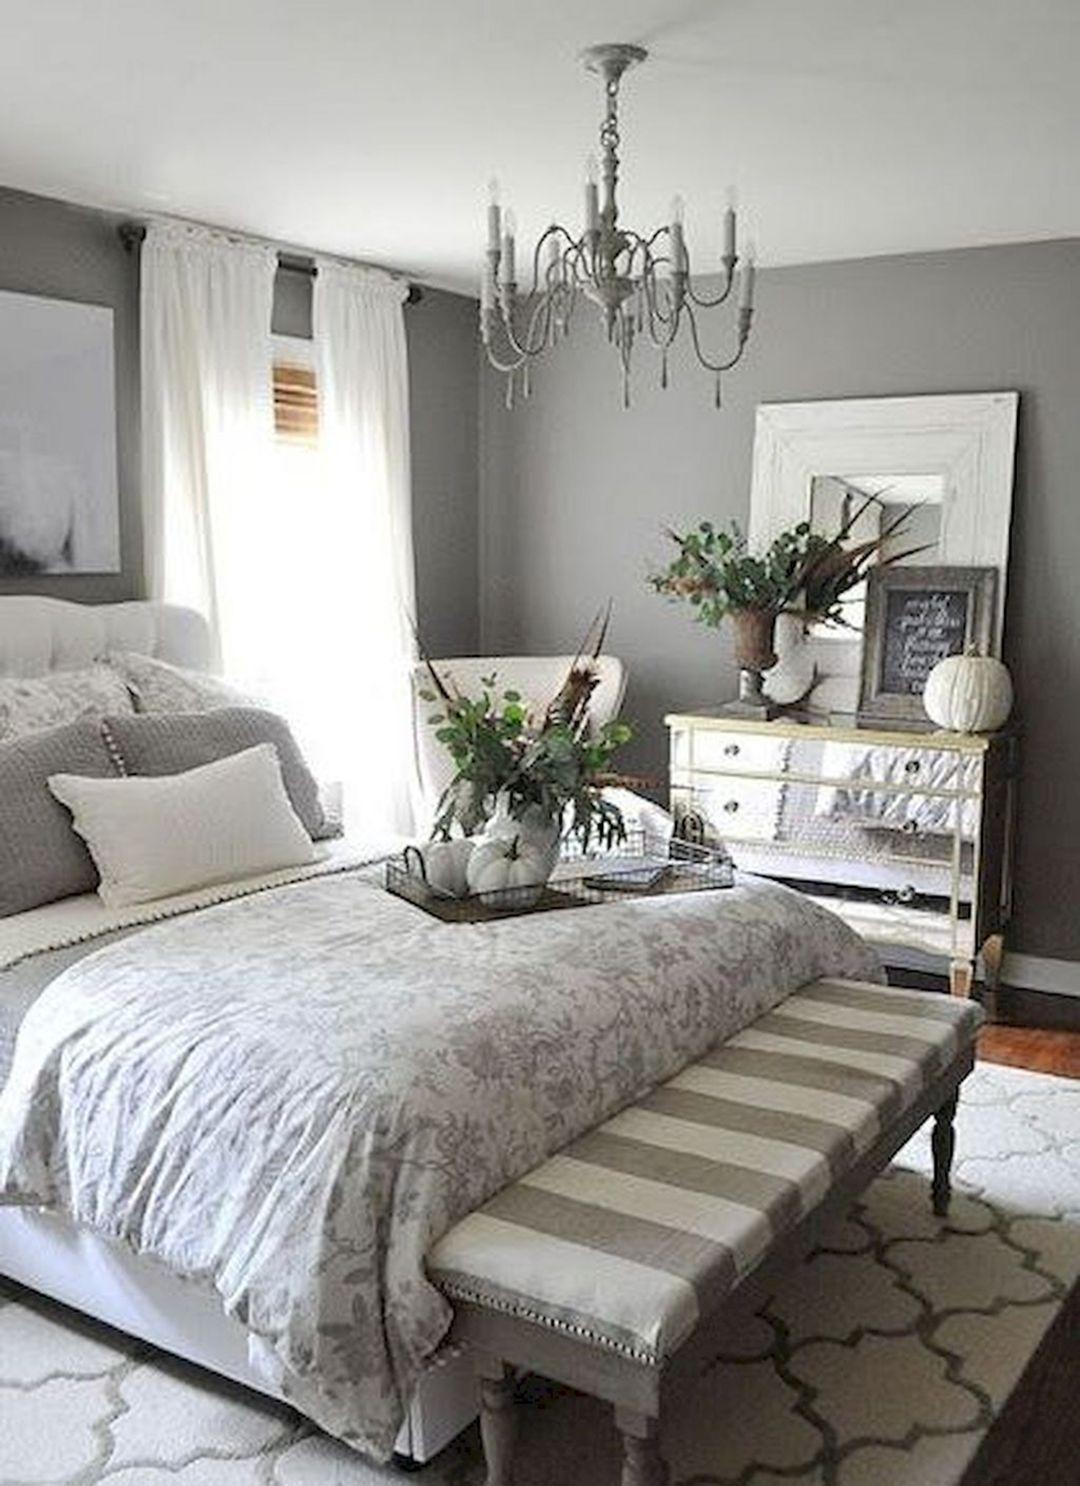 25 Best Farmhouse Master Bedroom Decor Ideas: 25+ Best And Creative Farmhouse Master Bedroom Decorations